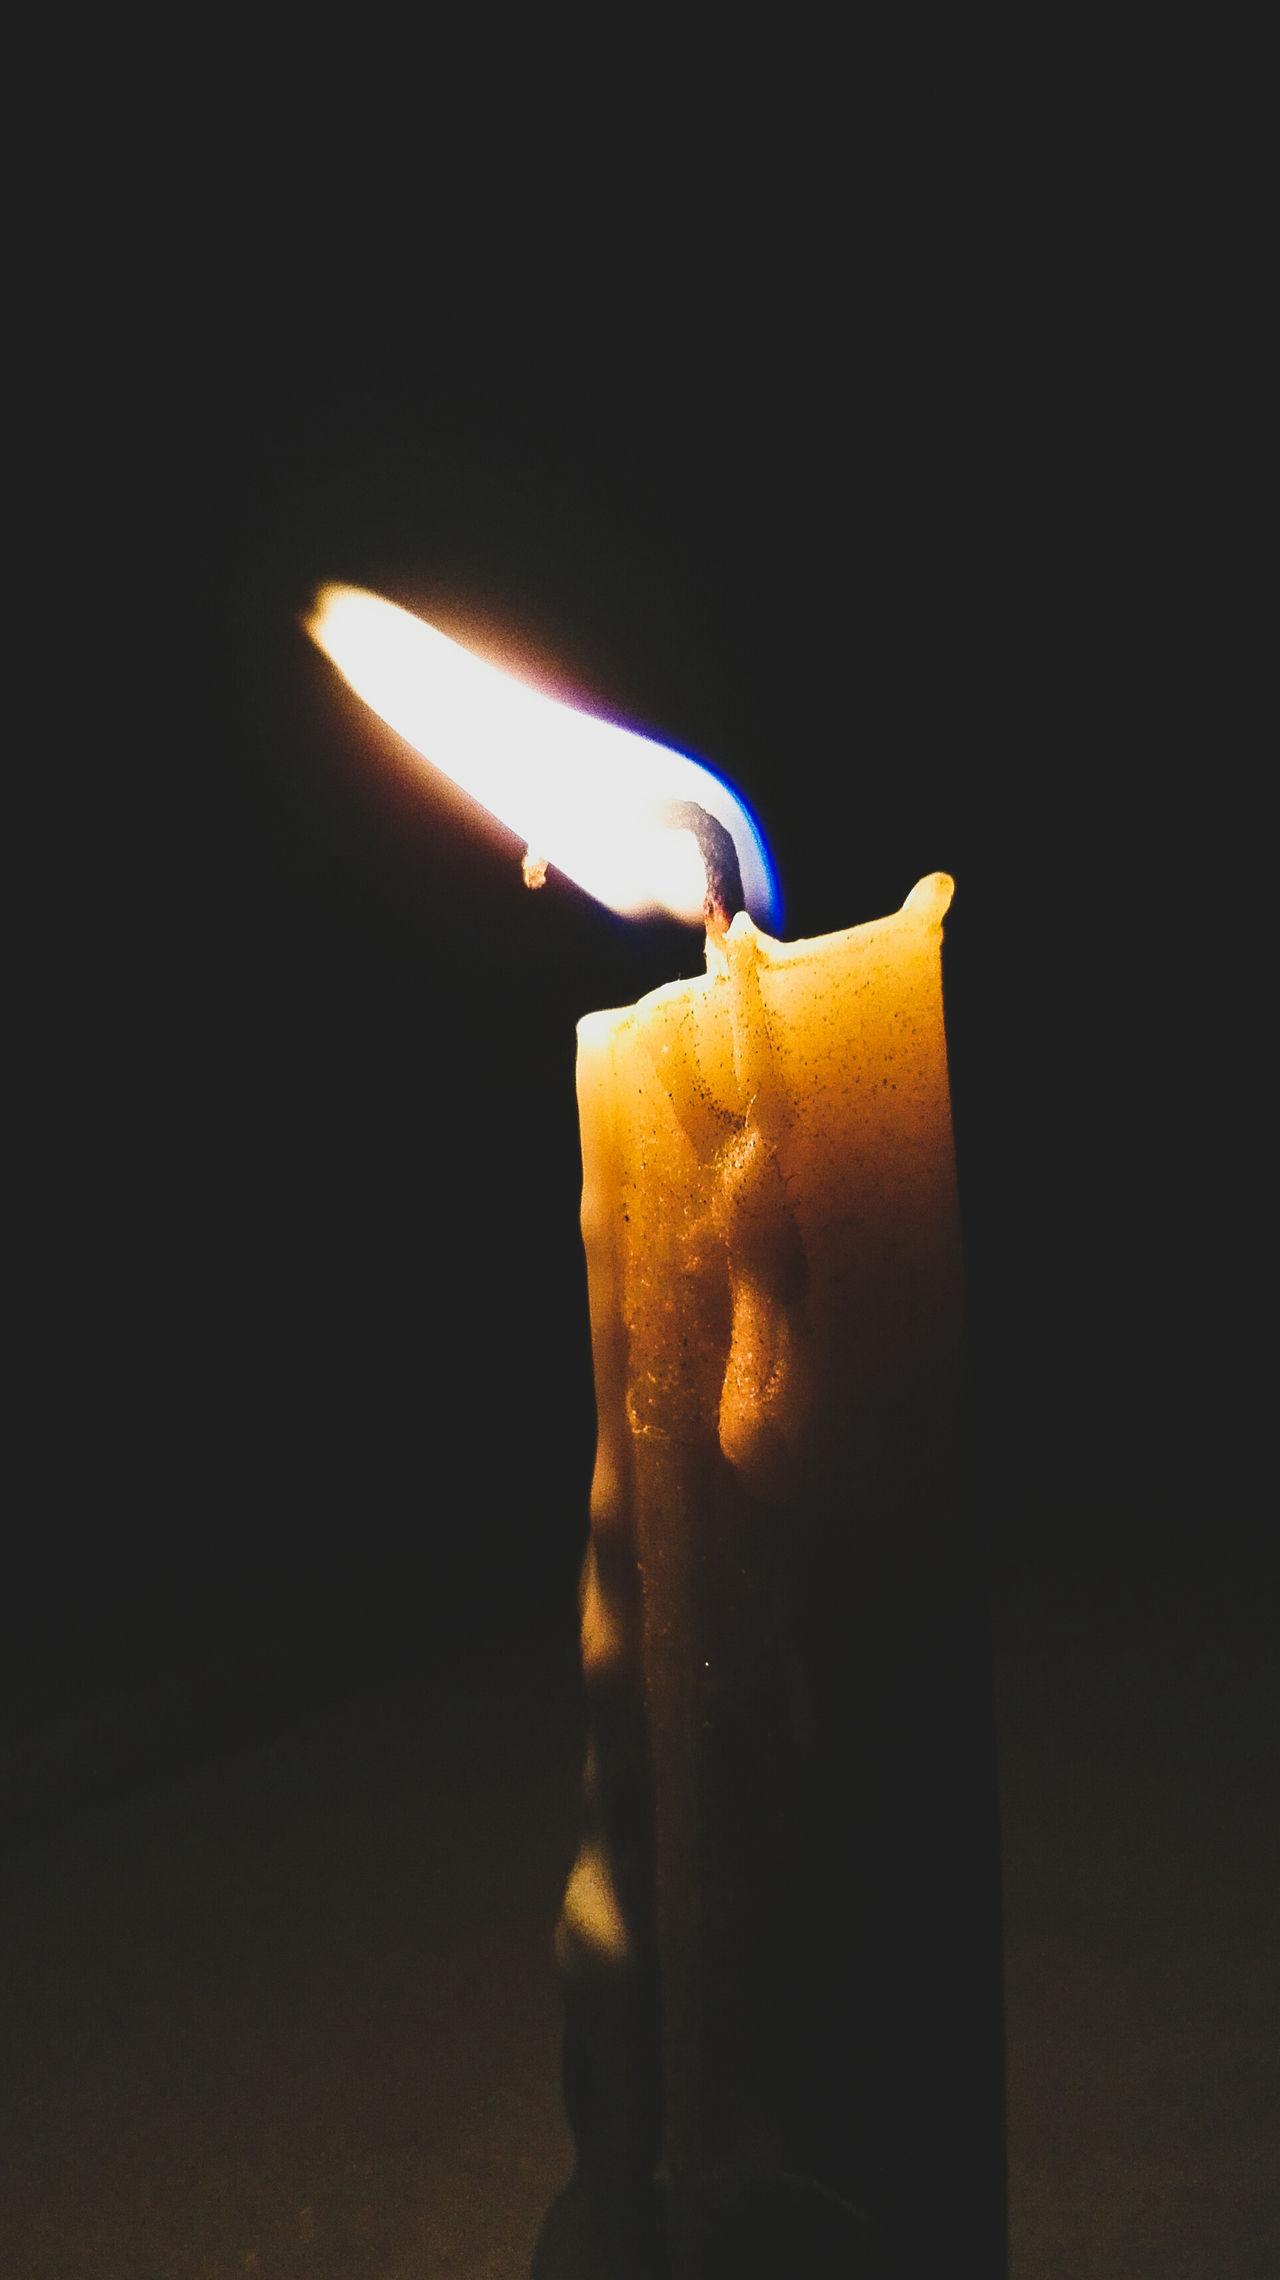 Take me away.. Beautiful Eye4photography  Flame Flames & Fire Nightphotography Darkroom Light Candle Candlelight Candleshoot Candle Flame Candle Collection Showcase June Macro Macro Photography Macroshot Macrolove